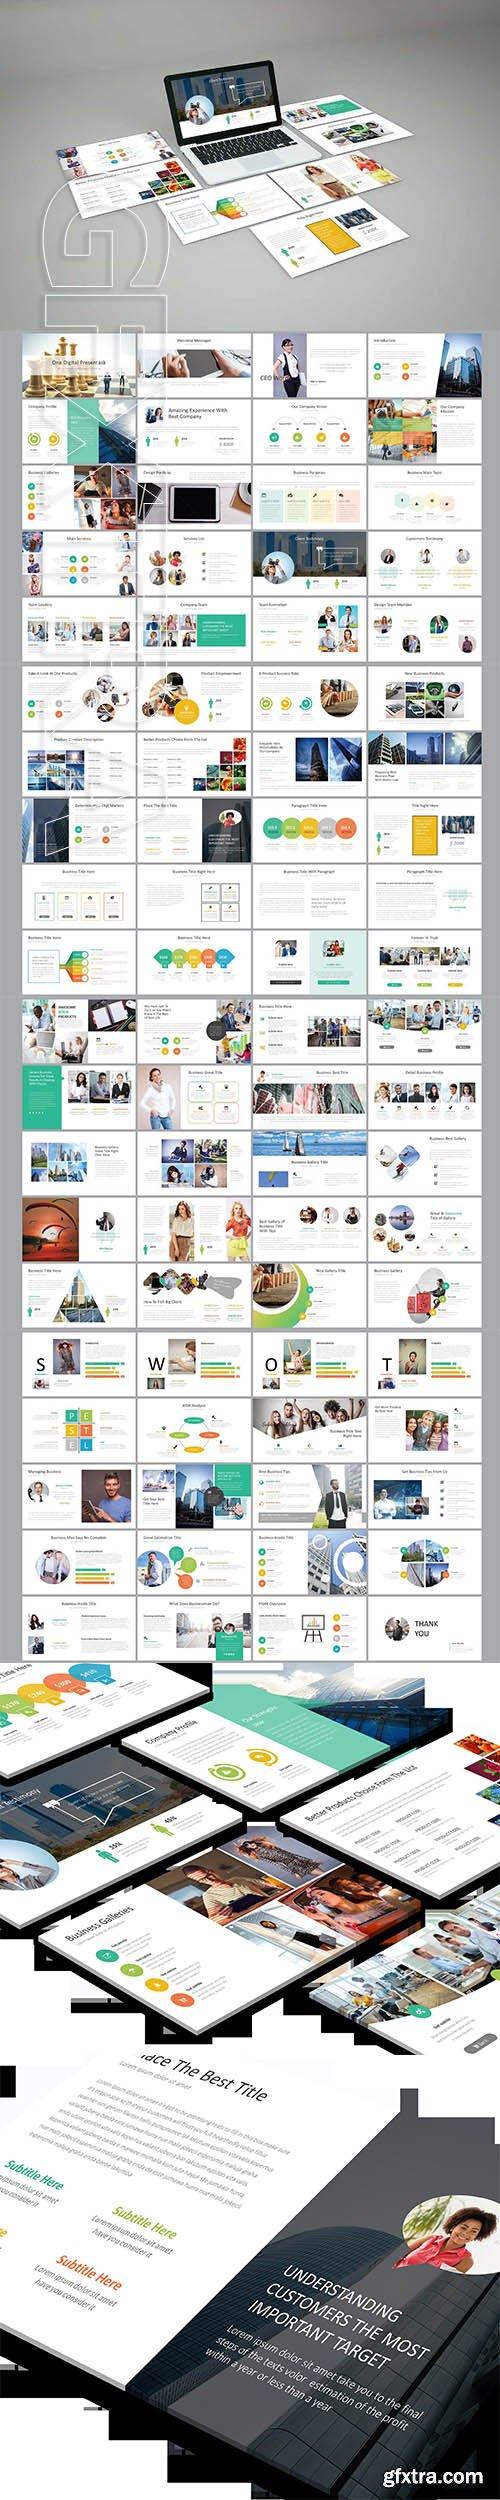 CM - Business Presentation Template 2632921